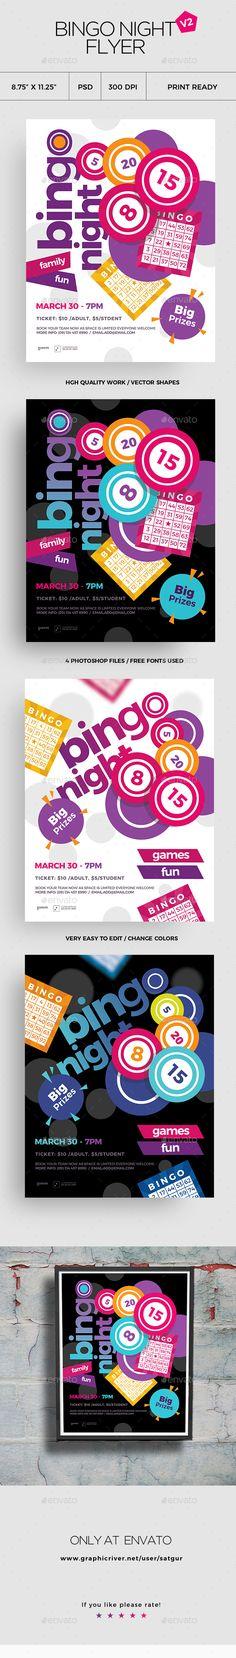 107 Best Bingo Night Images On Pinterest Auction Items Silent